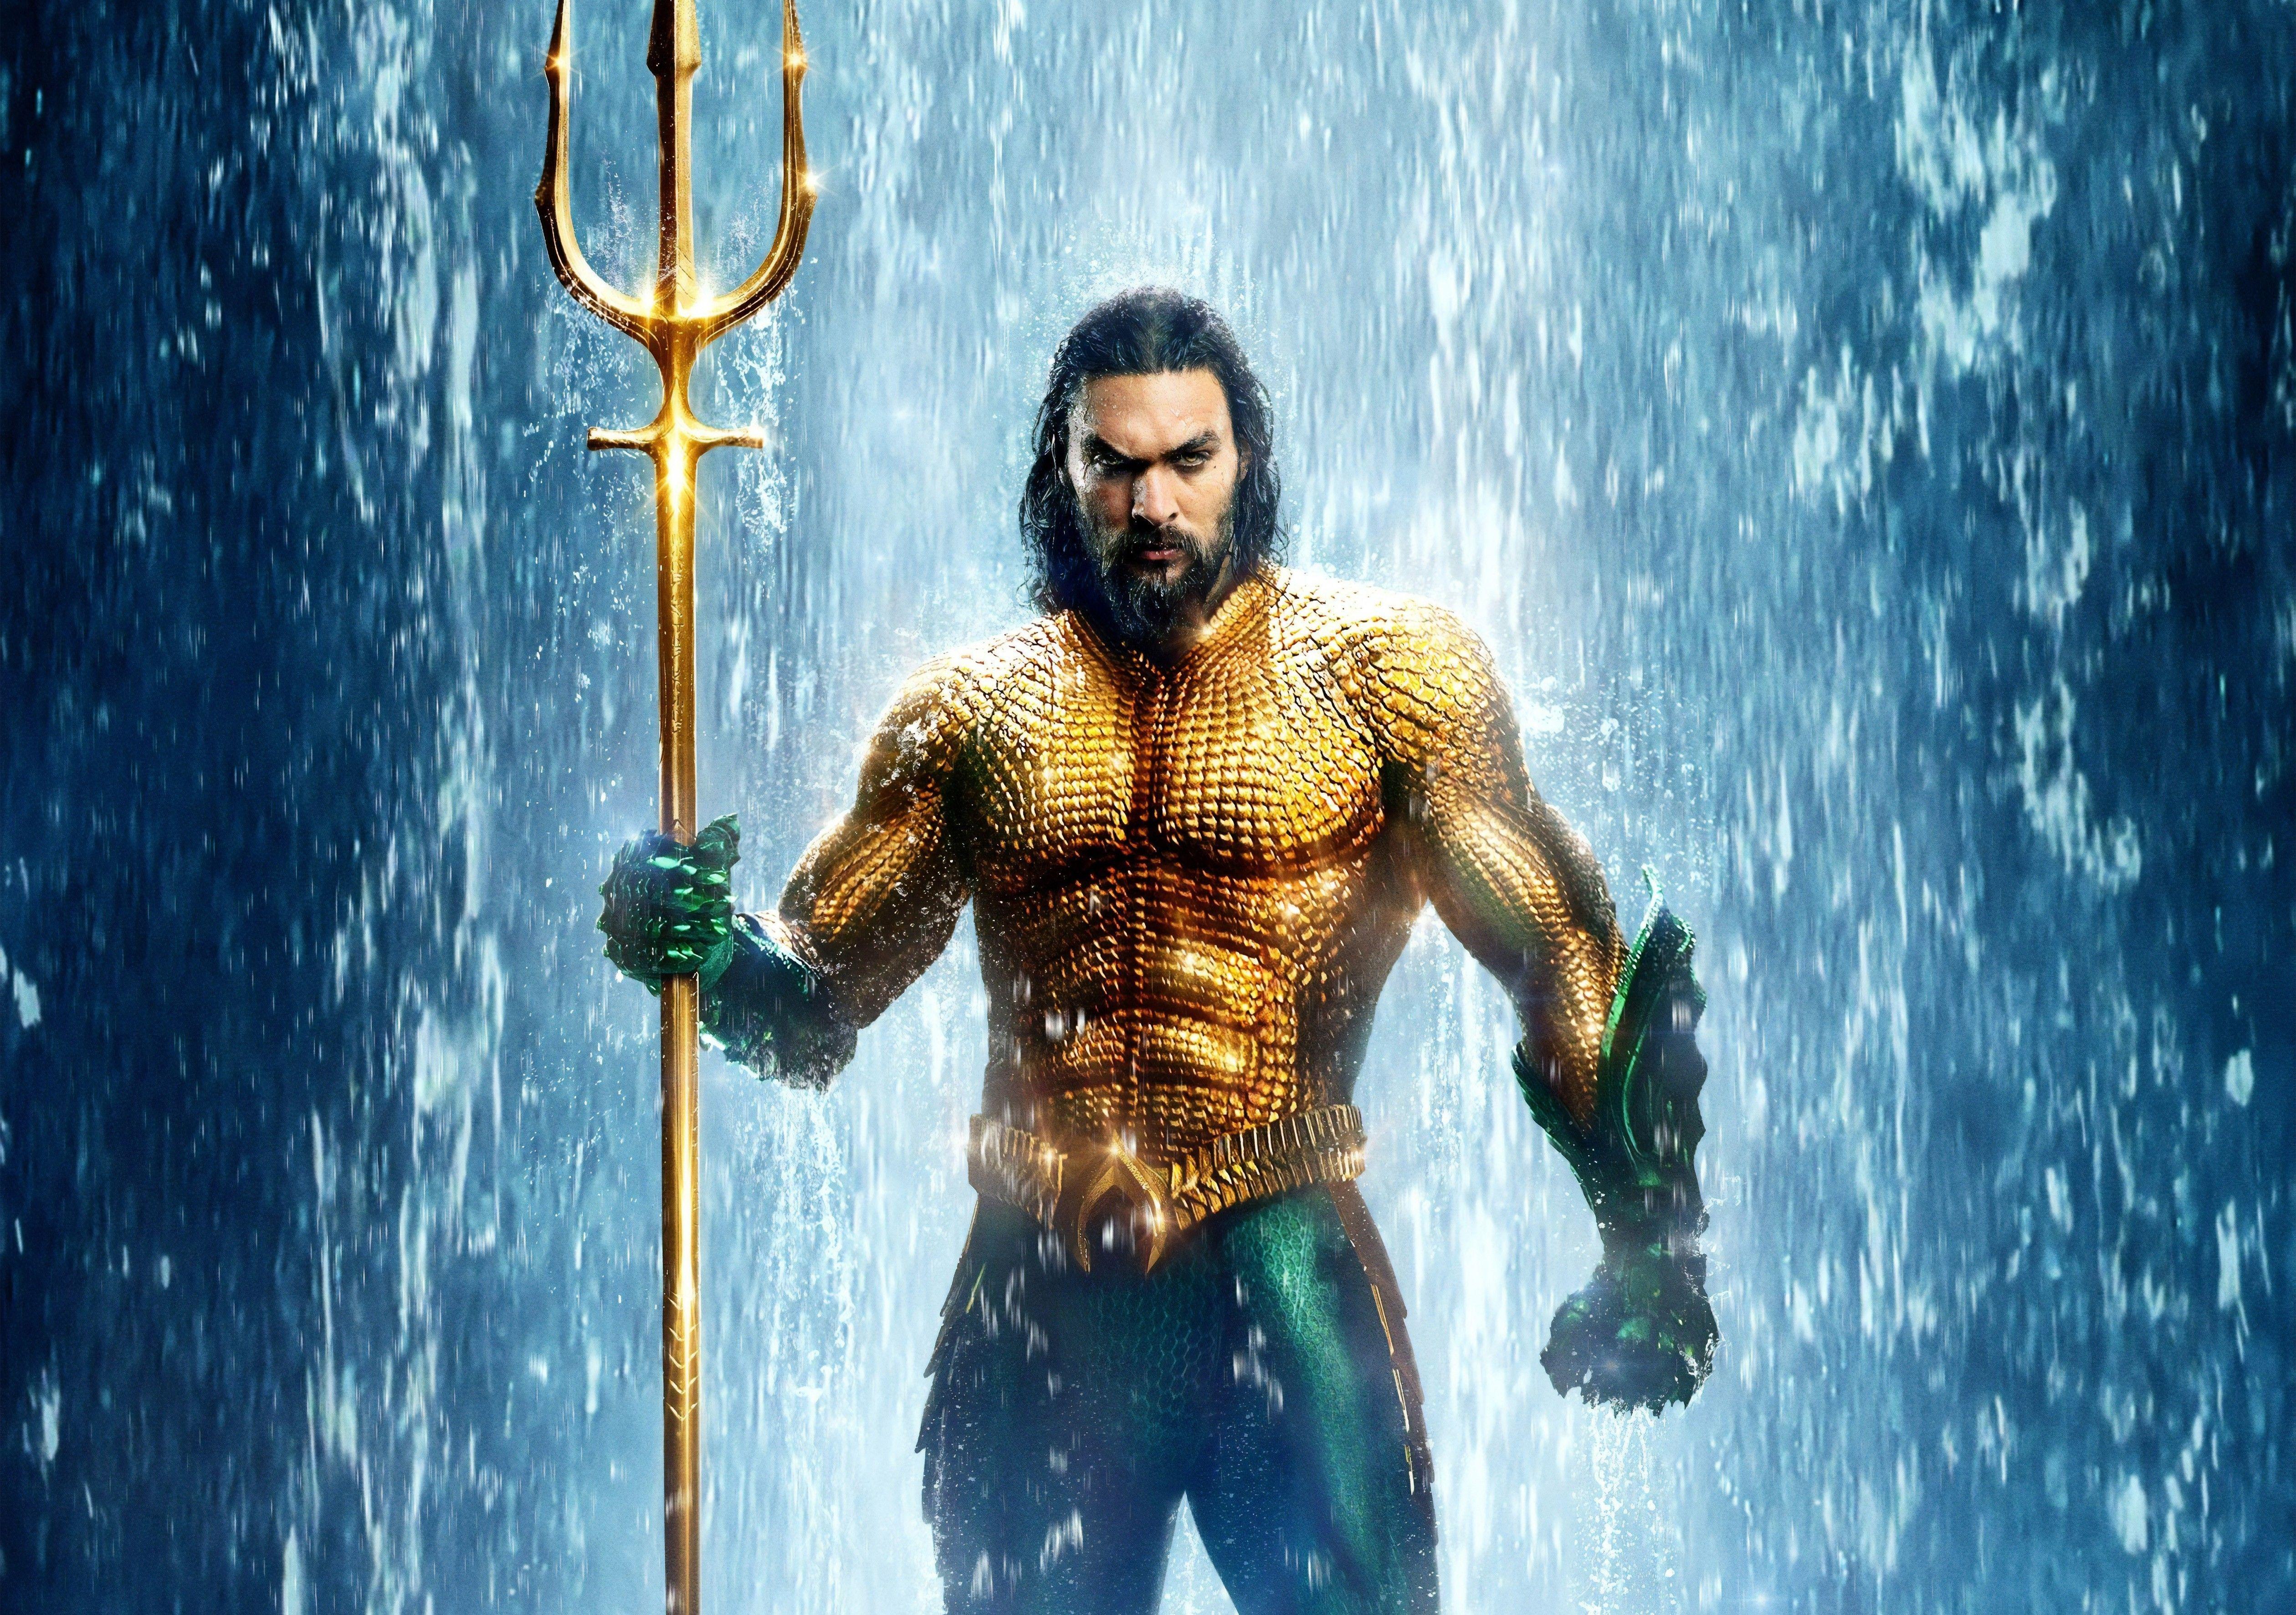 Jason Momoa Aquaman Wallpapers Top Free Jason Momoa Aquaman Backgrounds Wallpaperaccess